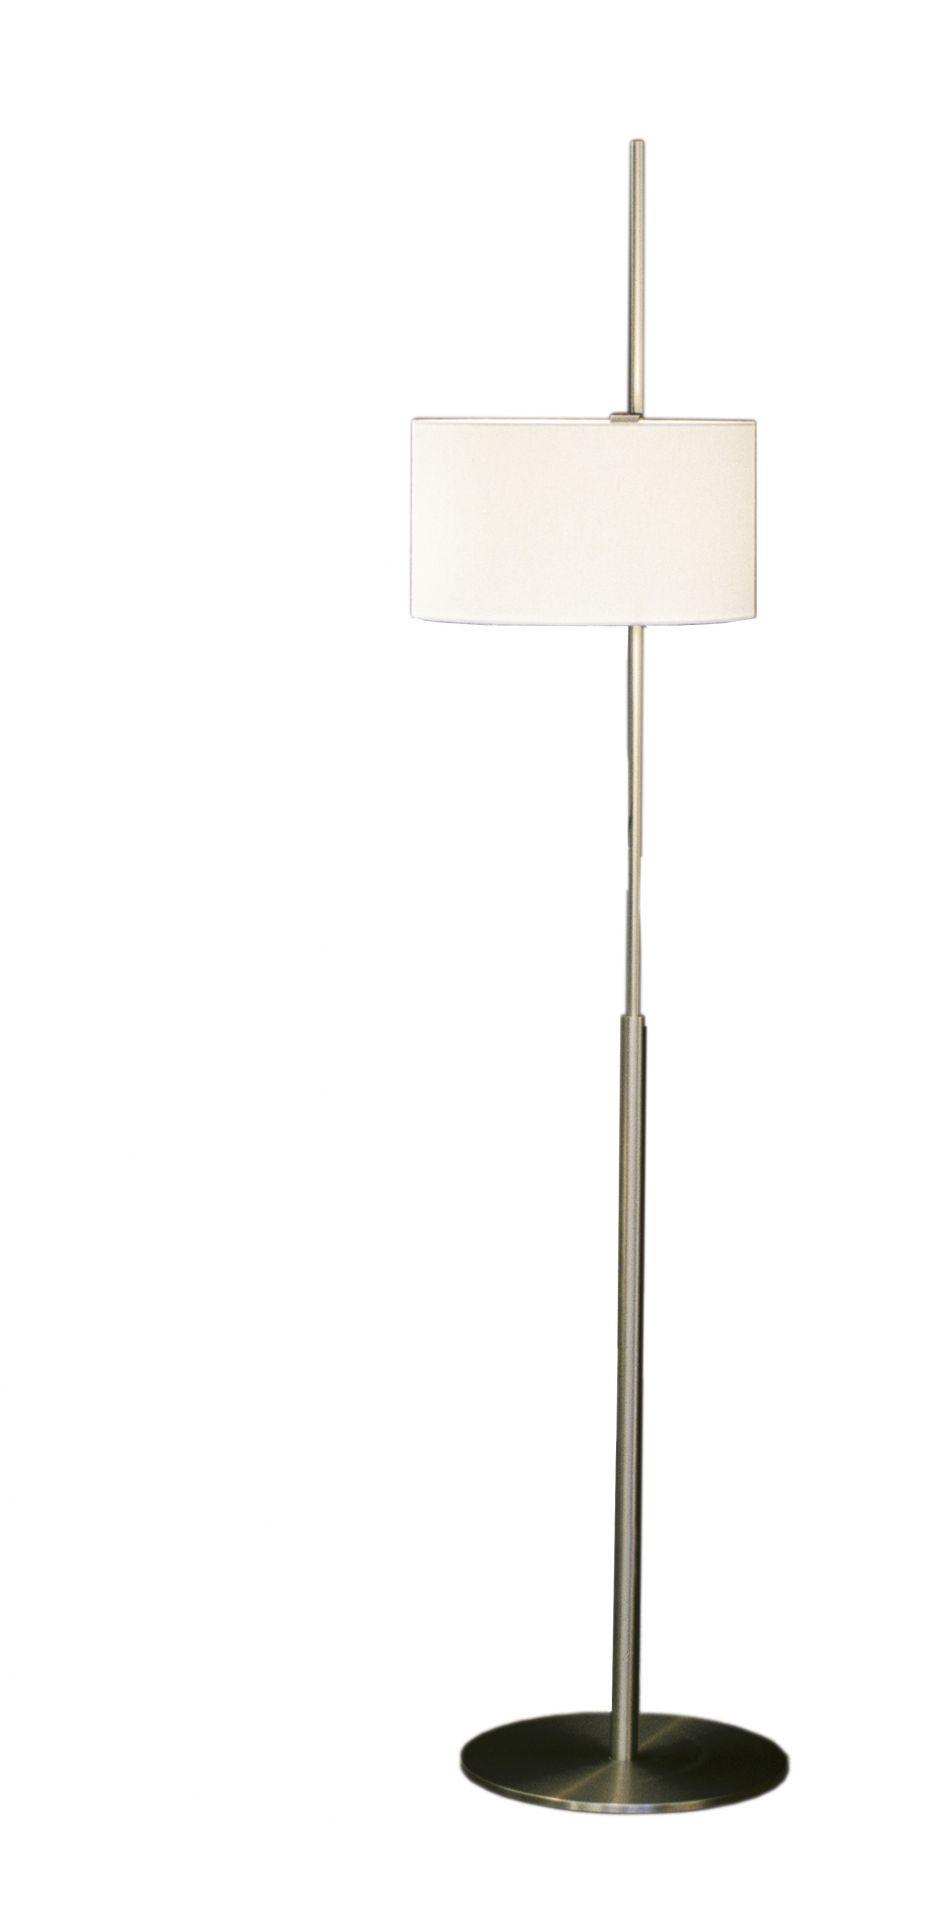 TMD Floor lamp Santa & Cole